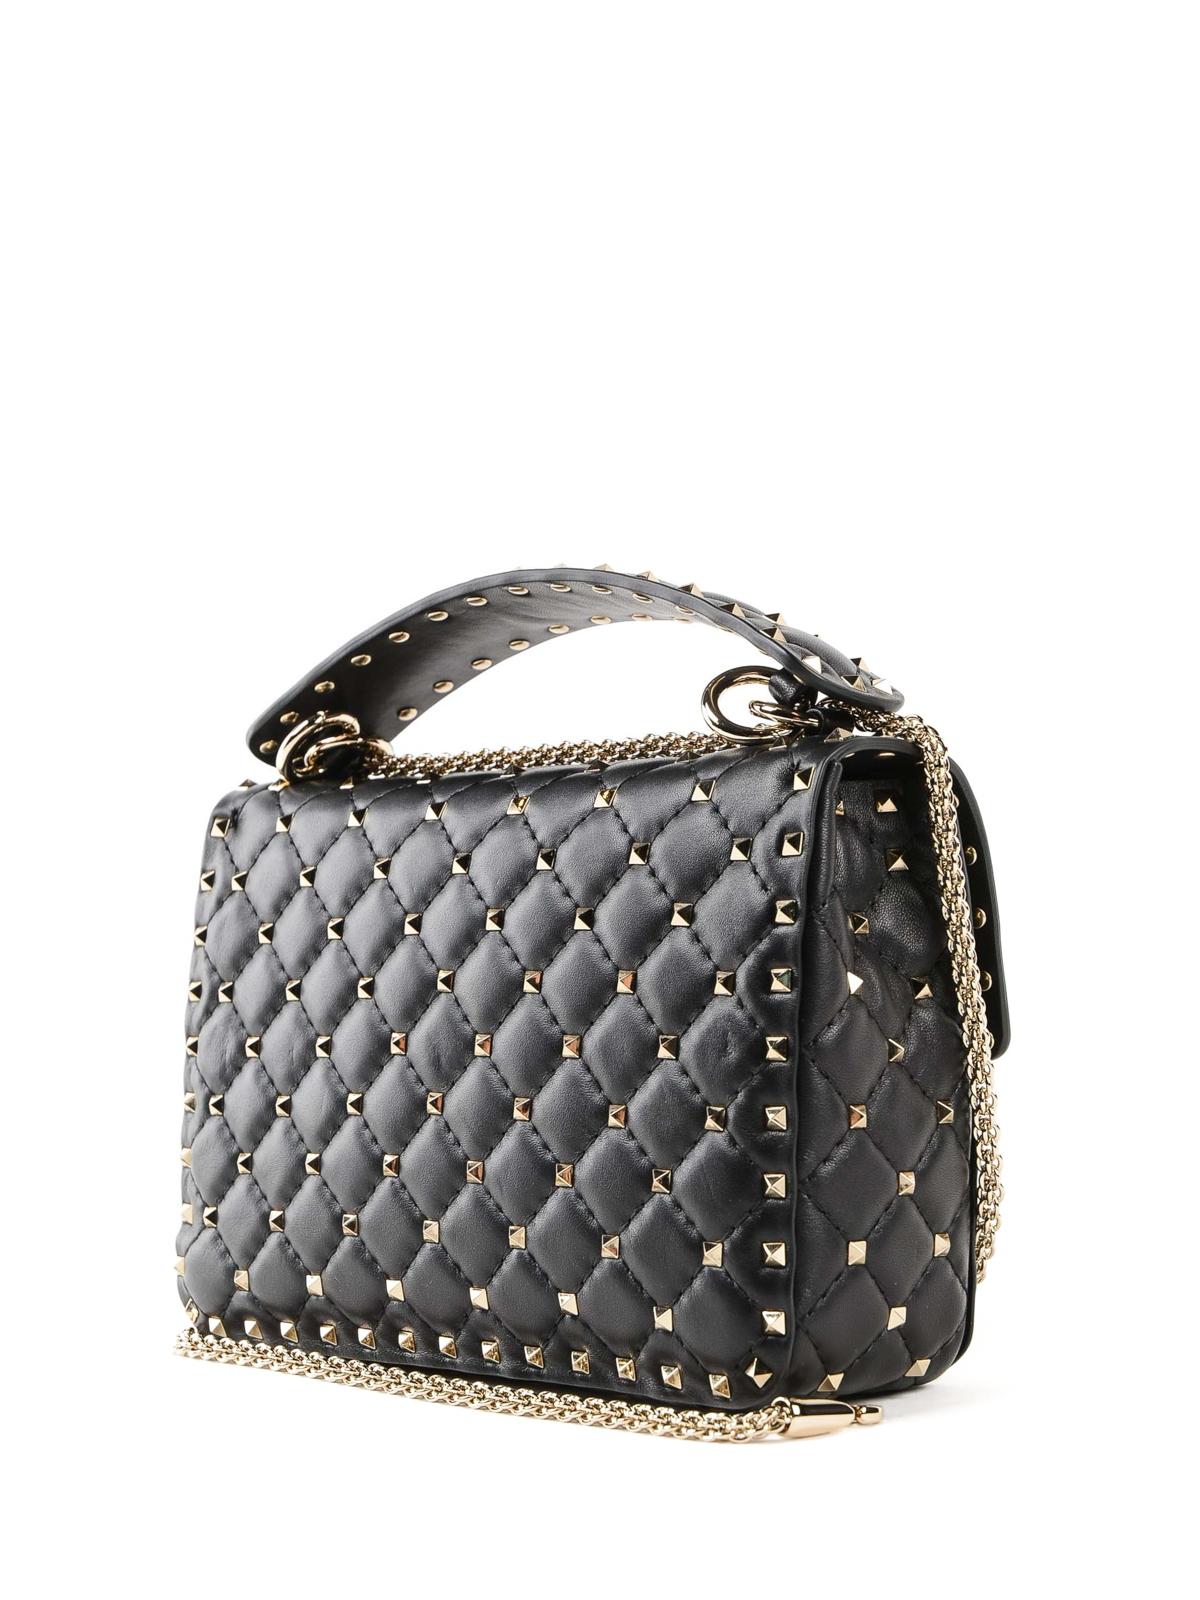 bae4a5126db iKRIX VALENTINO GARAVANI  cross body bags - Rockstud Spike black crossbody  bag